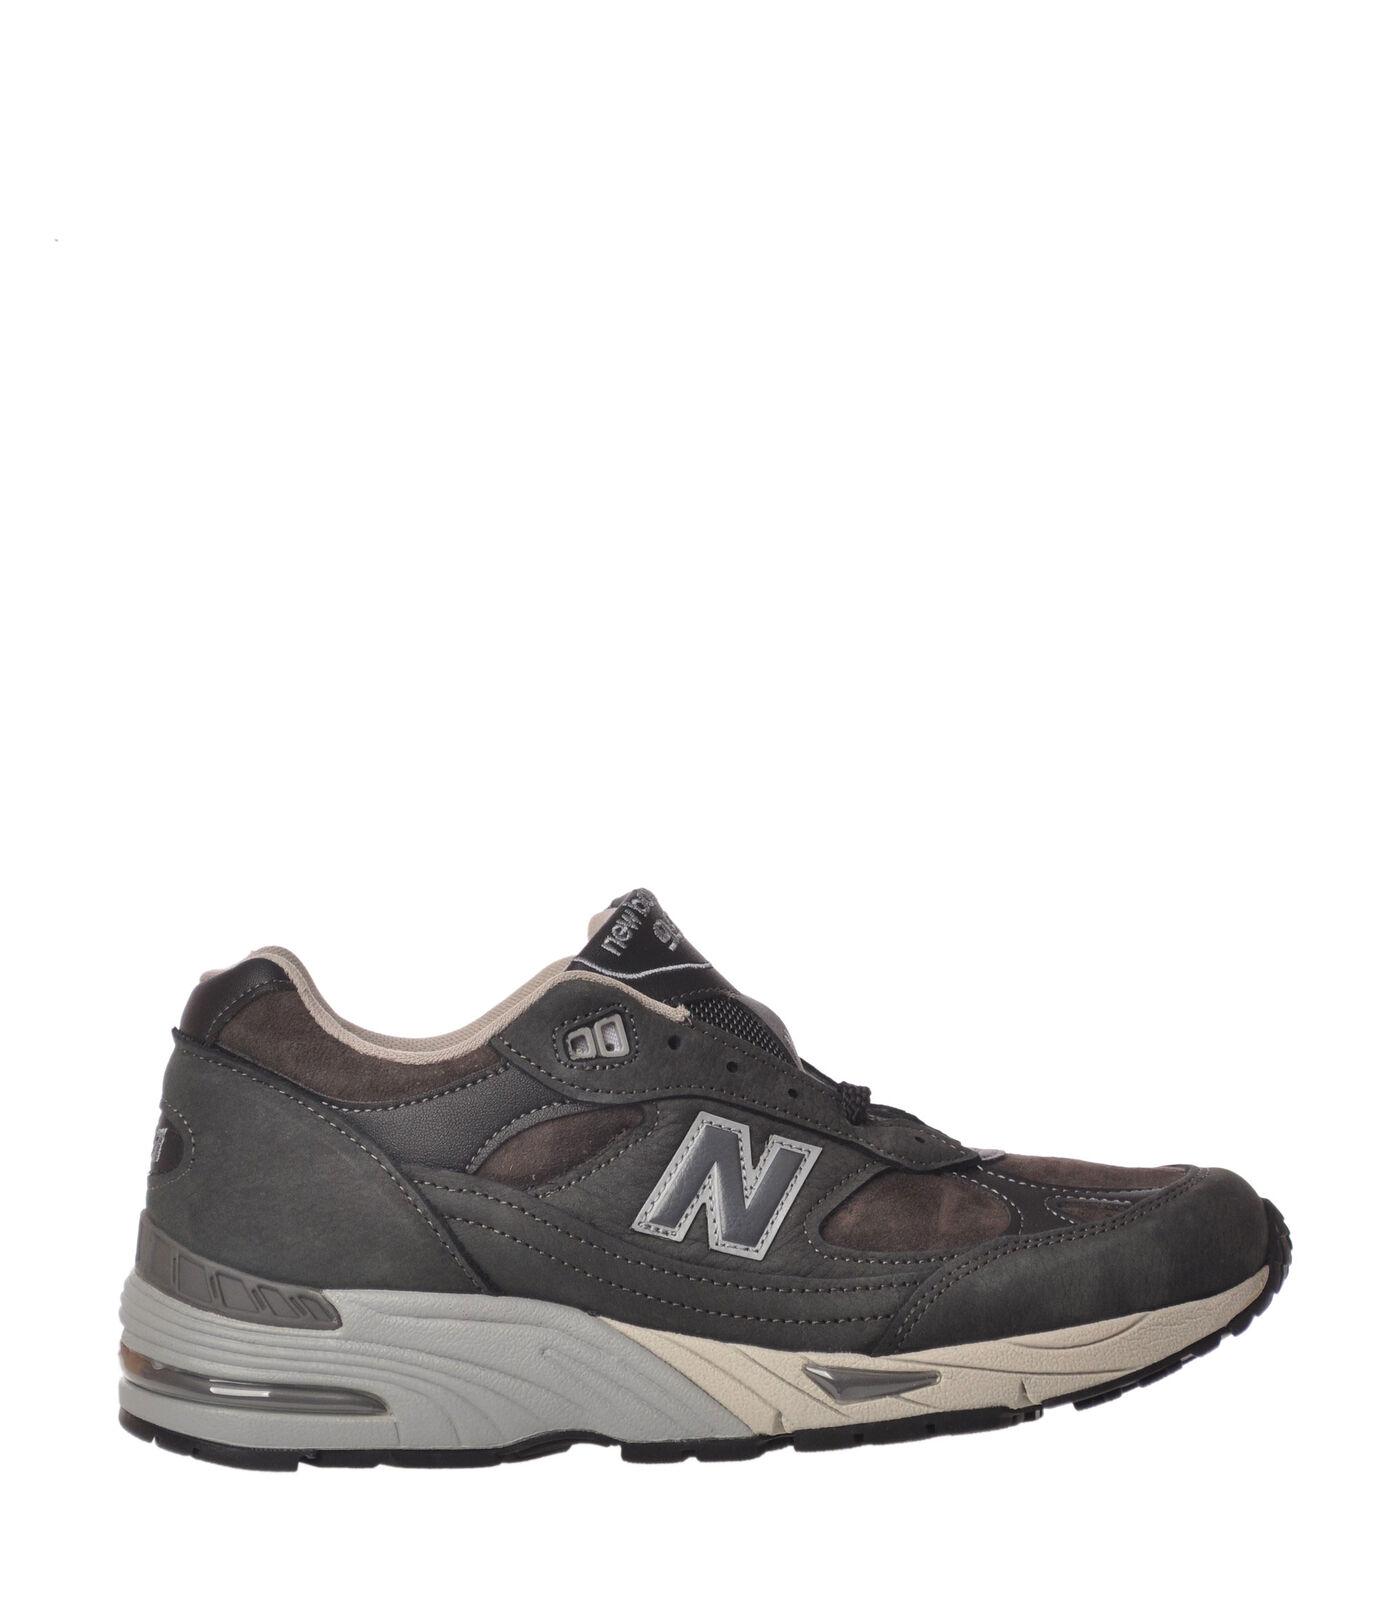 New Balance - shoes-Lace Up - Man - Grey - 4031506C190556